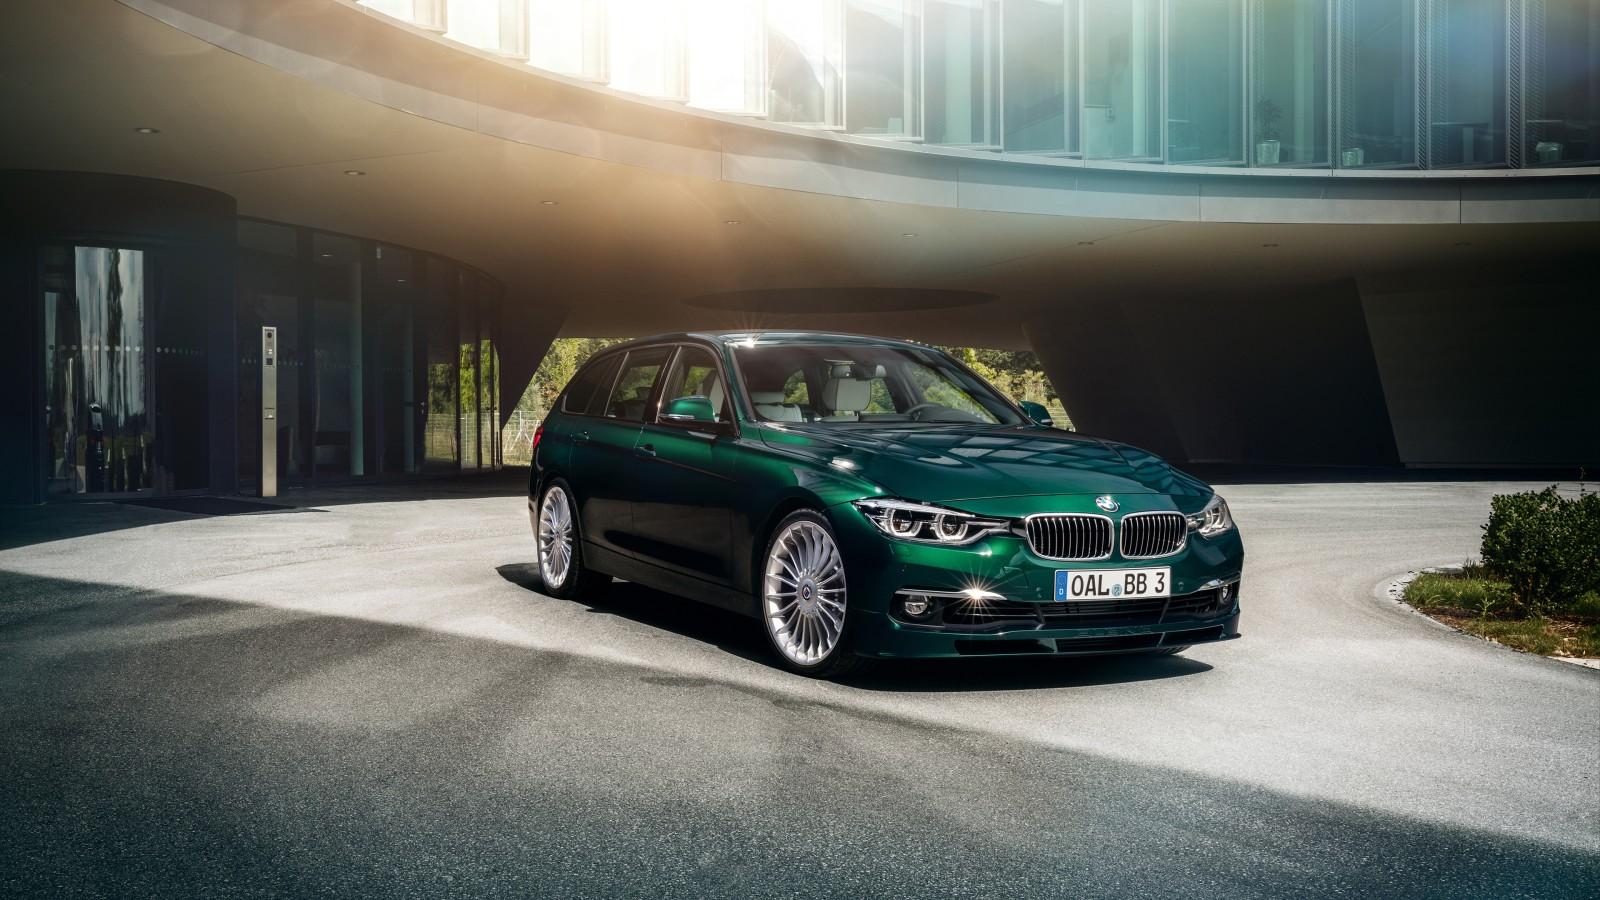 Alpina B3 BMW 3 Series 2015 Wallpaper | HD Car Wallpapers ...